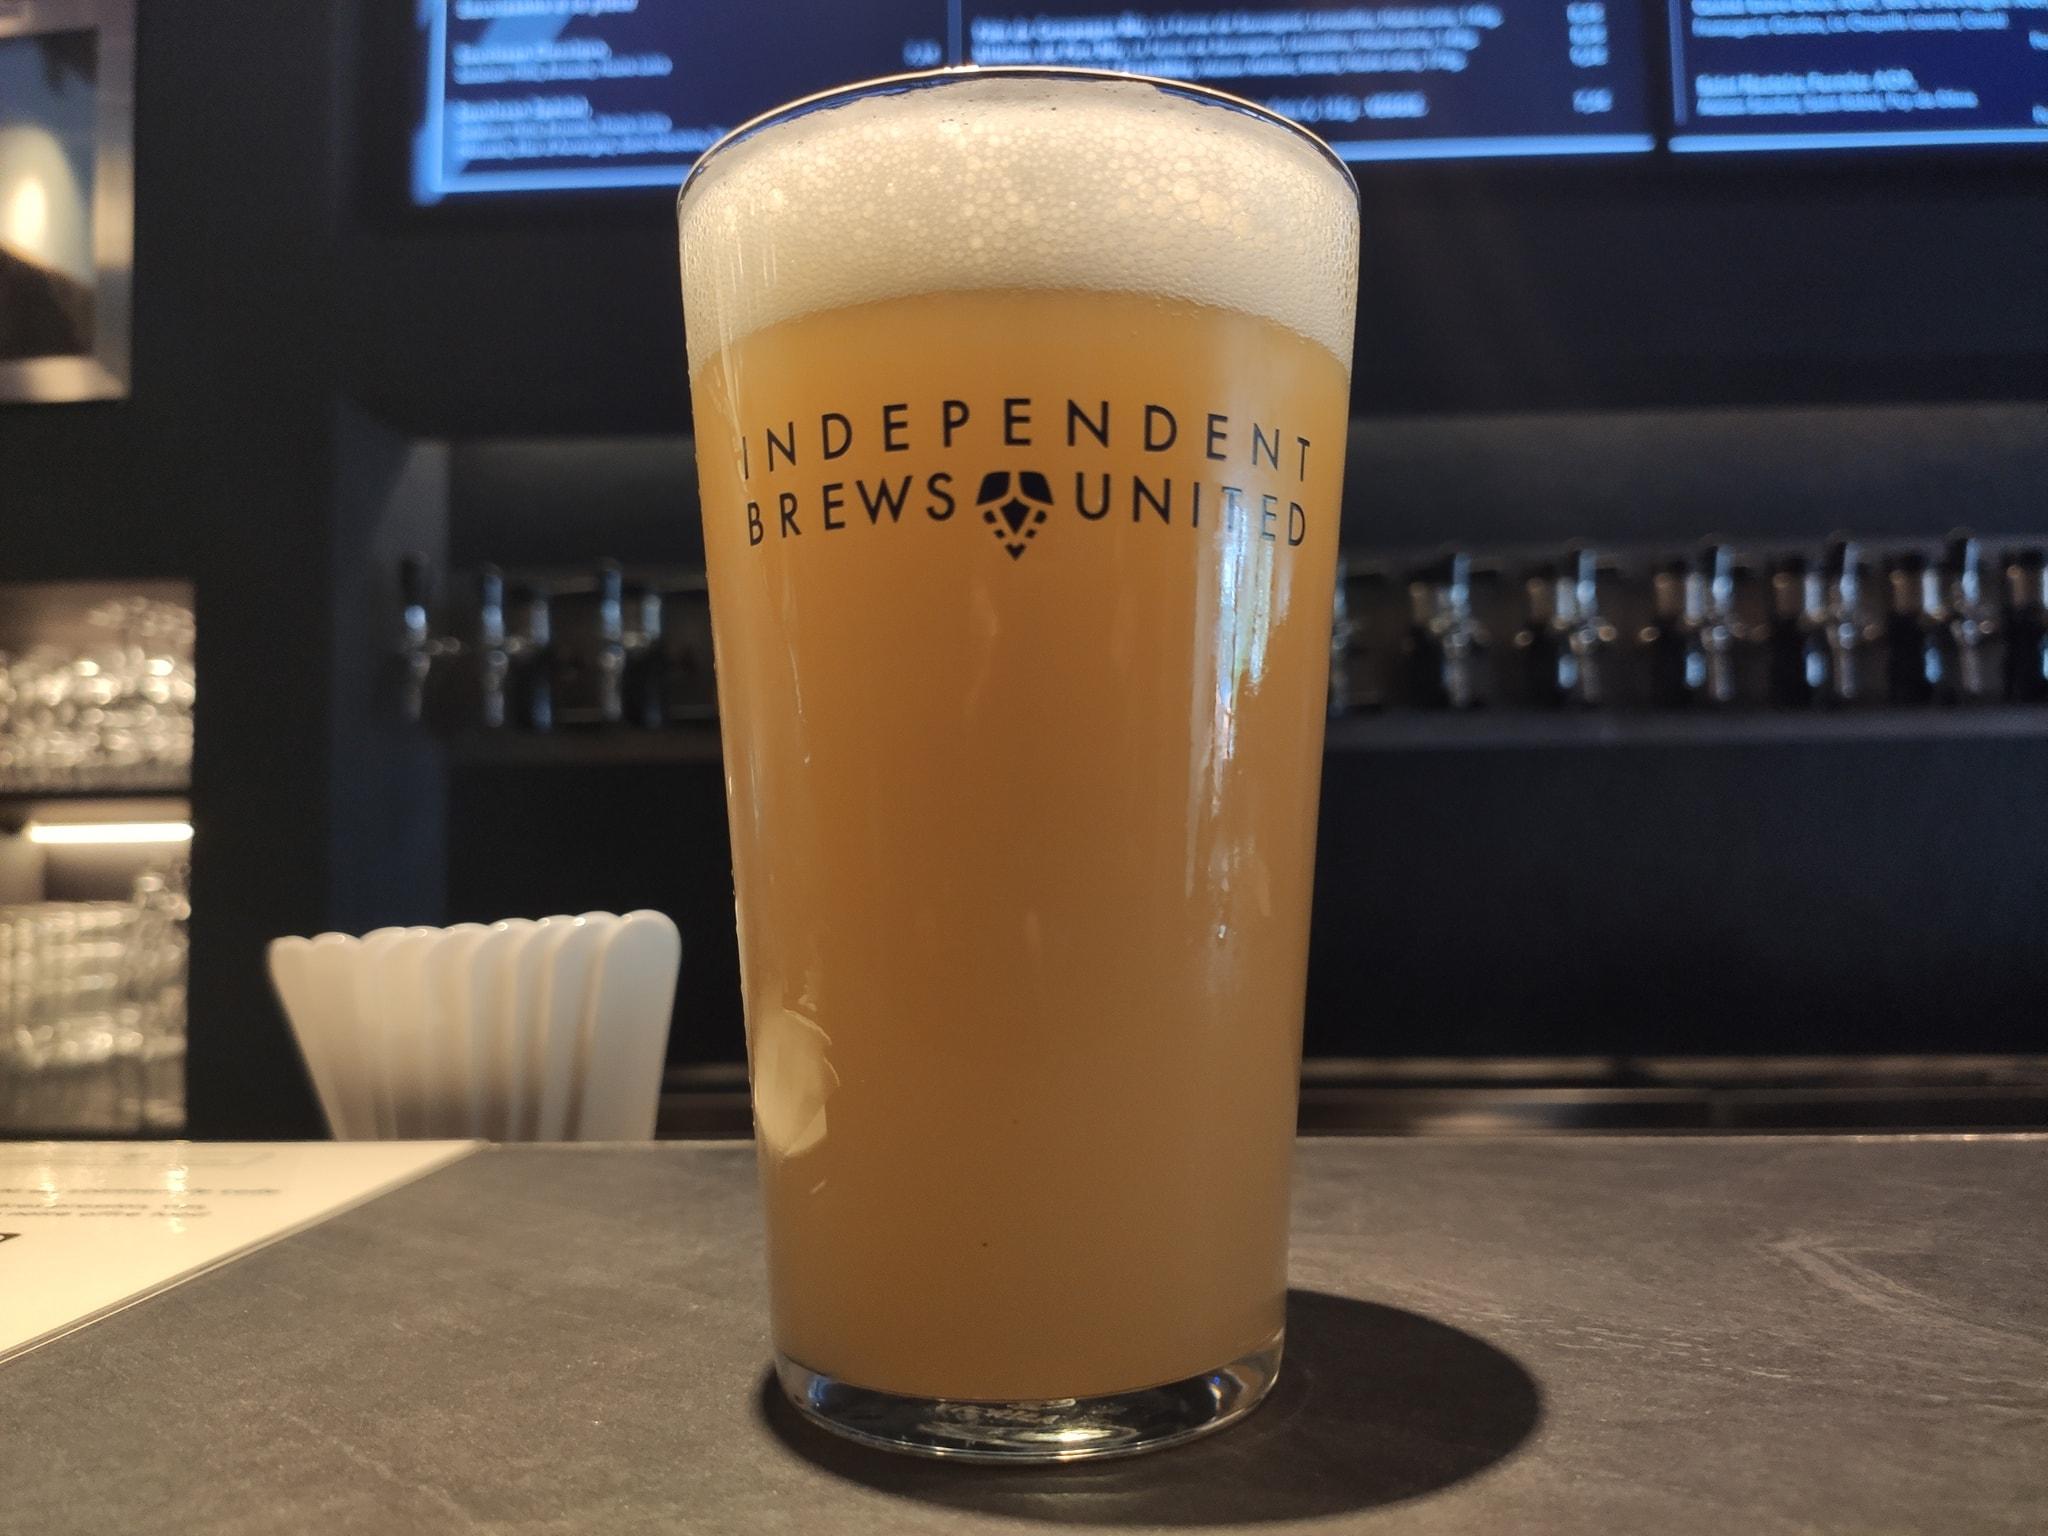 Pinte de craft beer - IBU Oberkampf - Independent Brews united